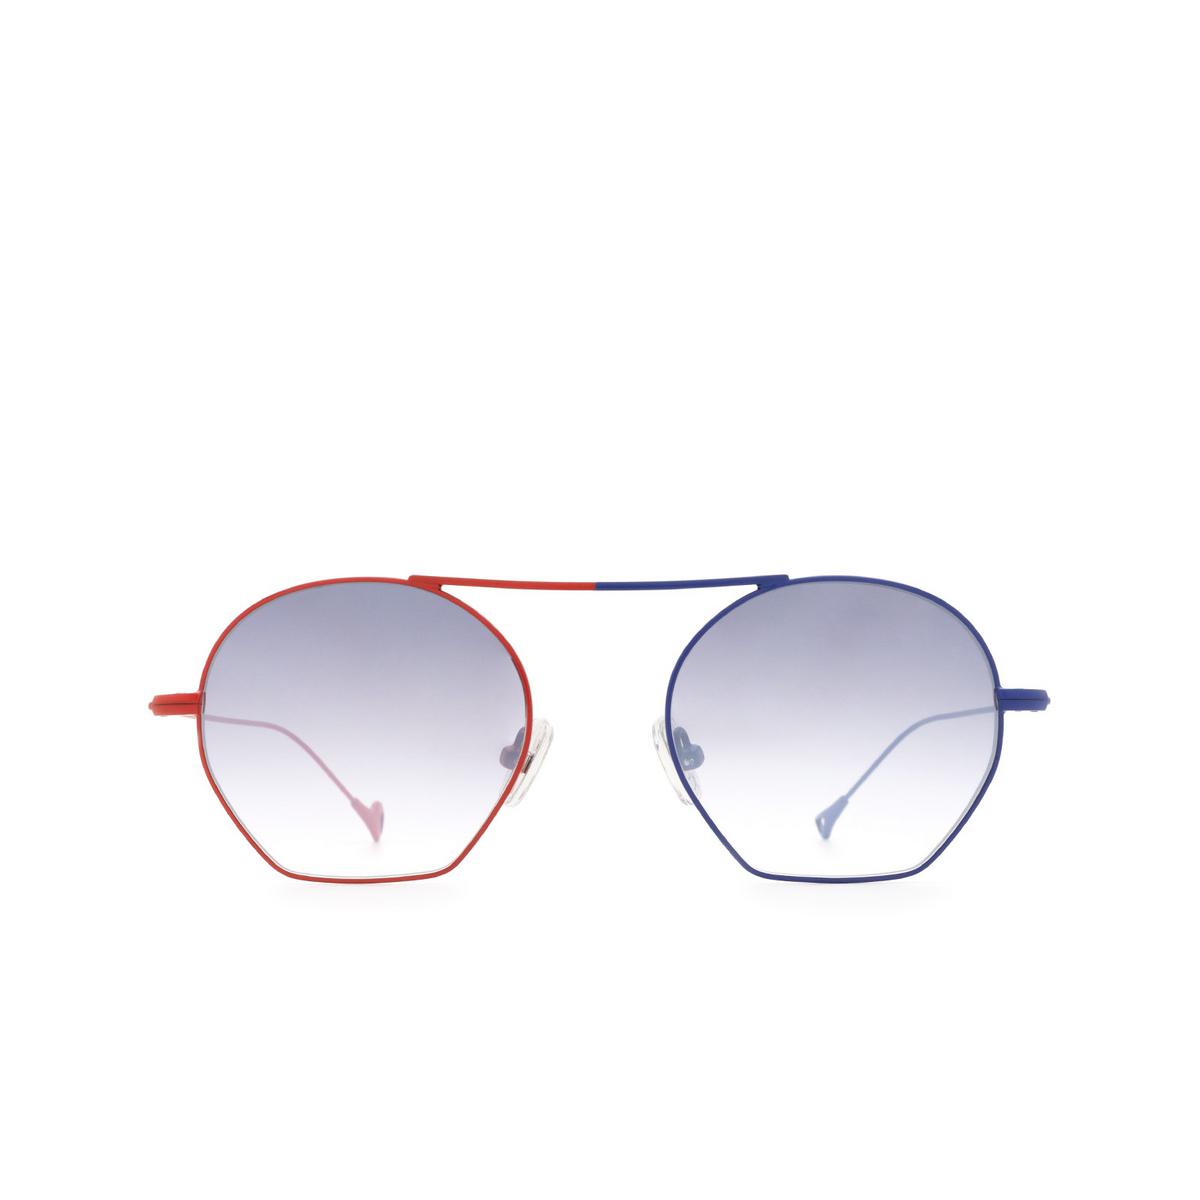 Eyepetizer® Irregular Sunglasses: Botafoch color Red & Blue C.18-27F - front view.